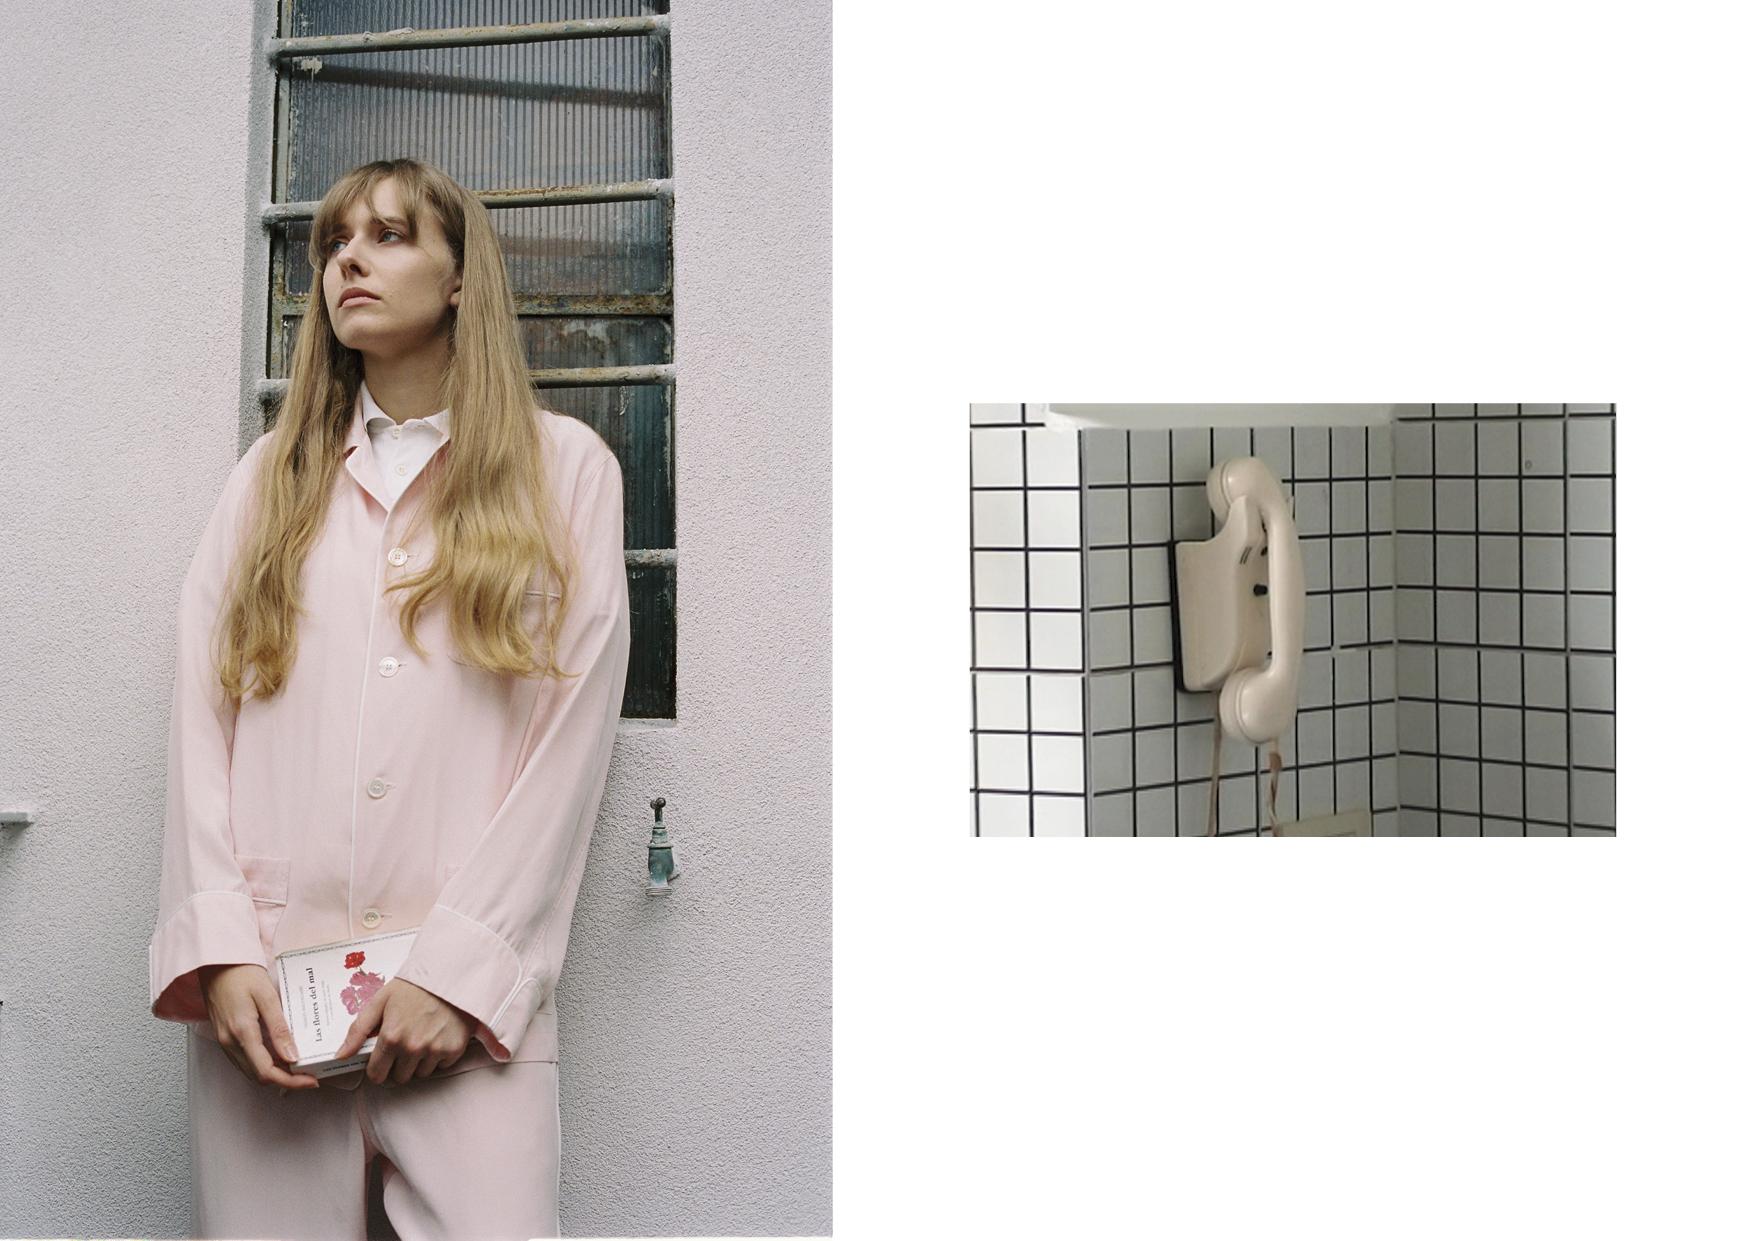 Silk nightwear shirt and trousers OLATZ, cotton polo LEVI'S